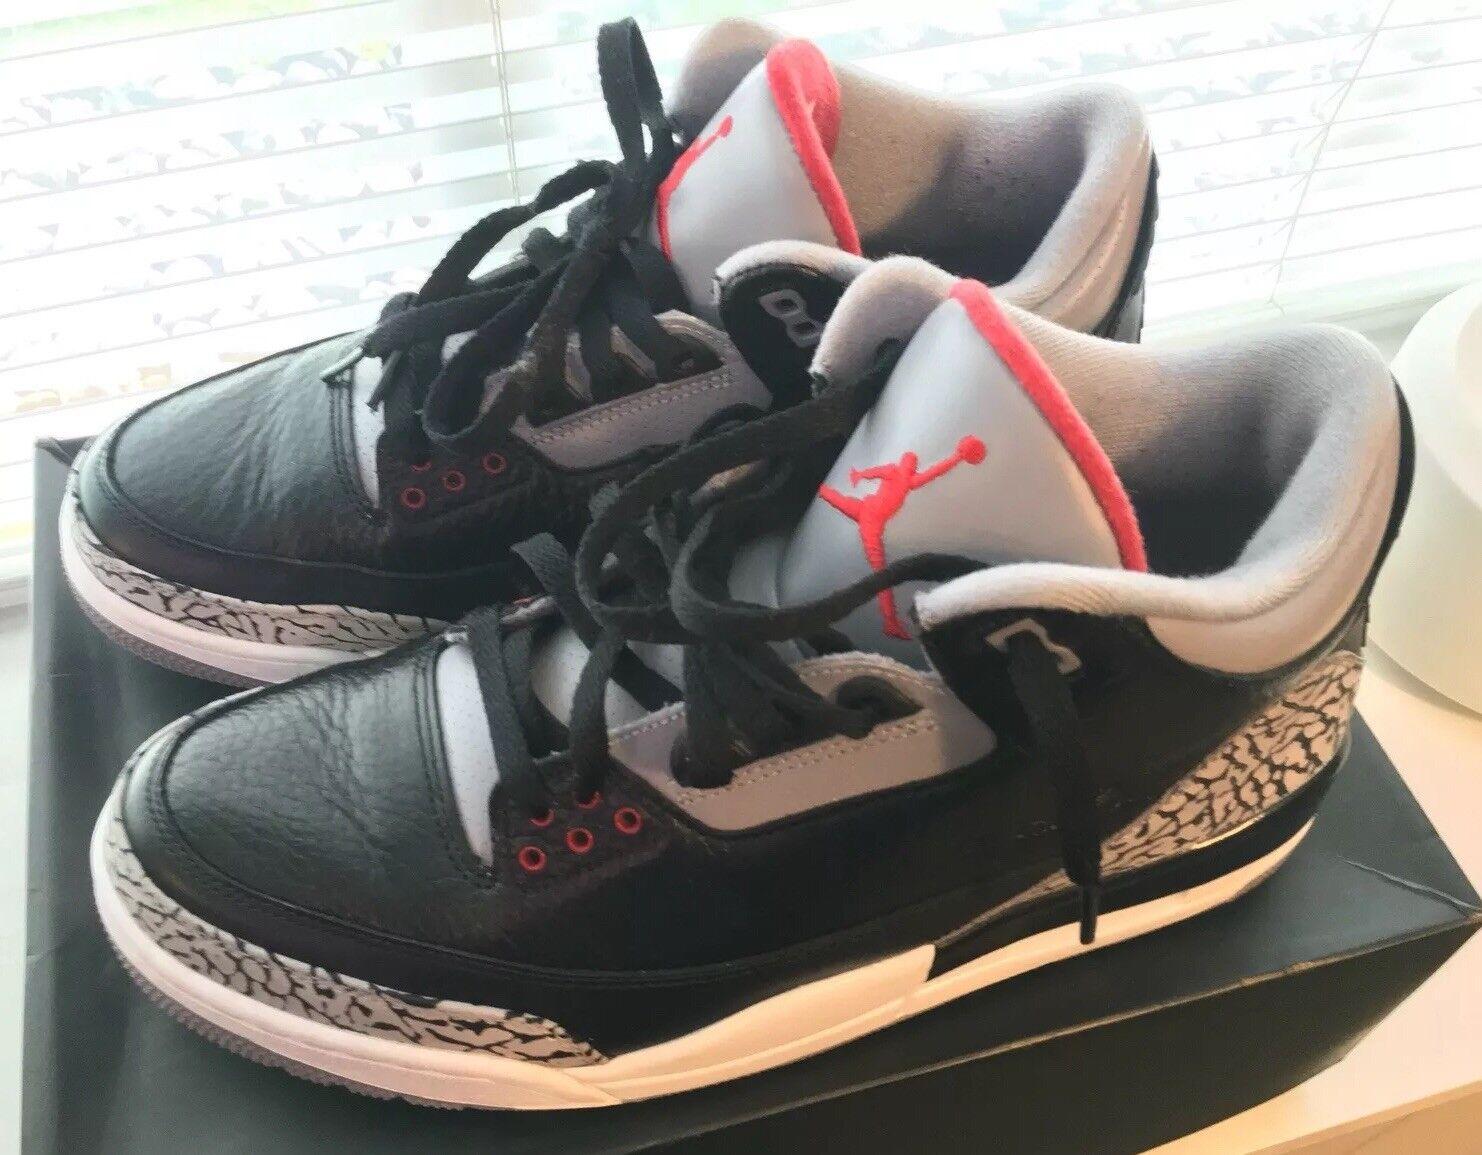 Nike Air Jordan 3 Black Cement 2011 Black Red Grey 136064-010 Men's Size 10.5